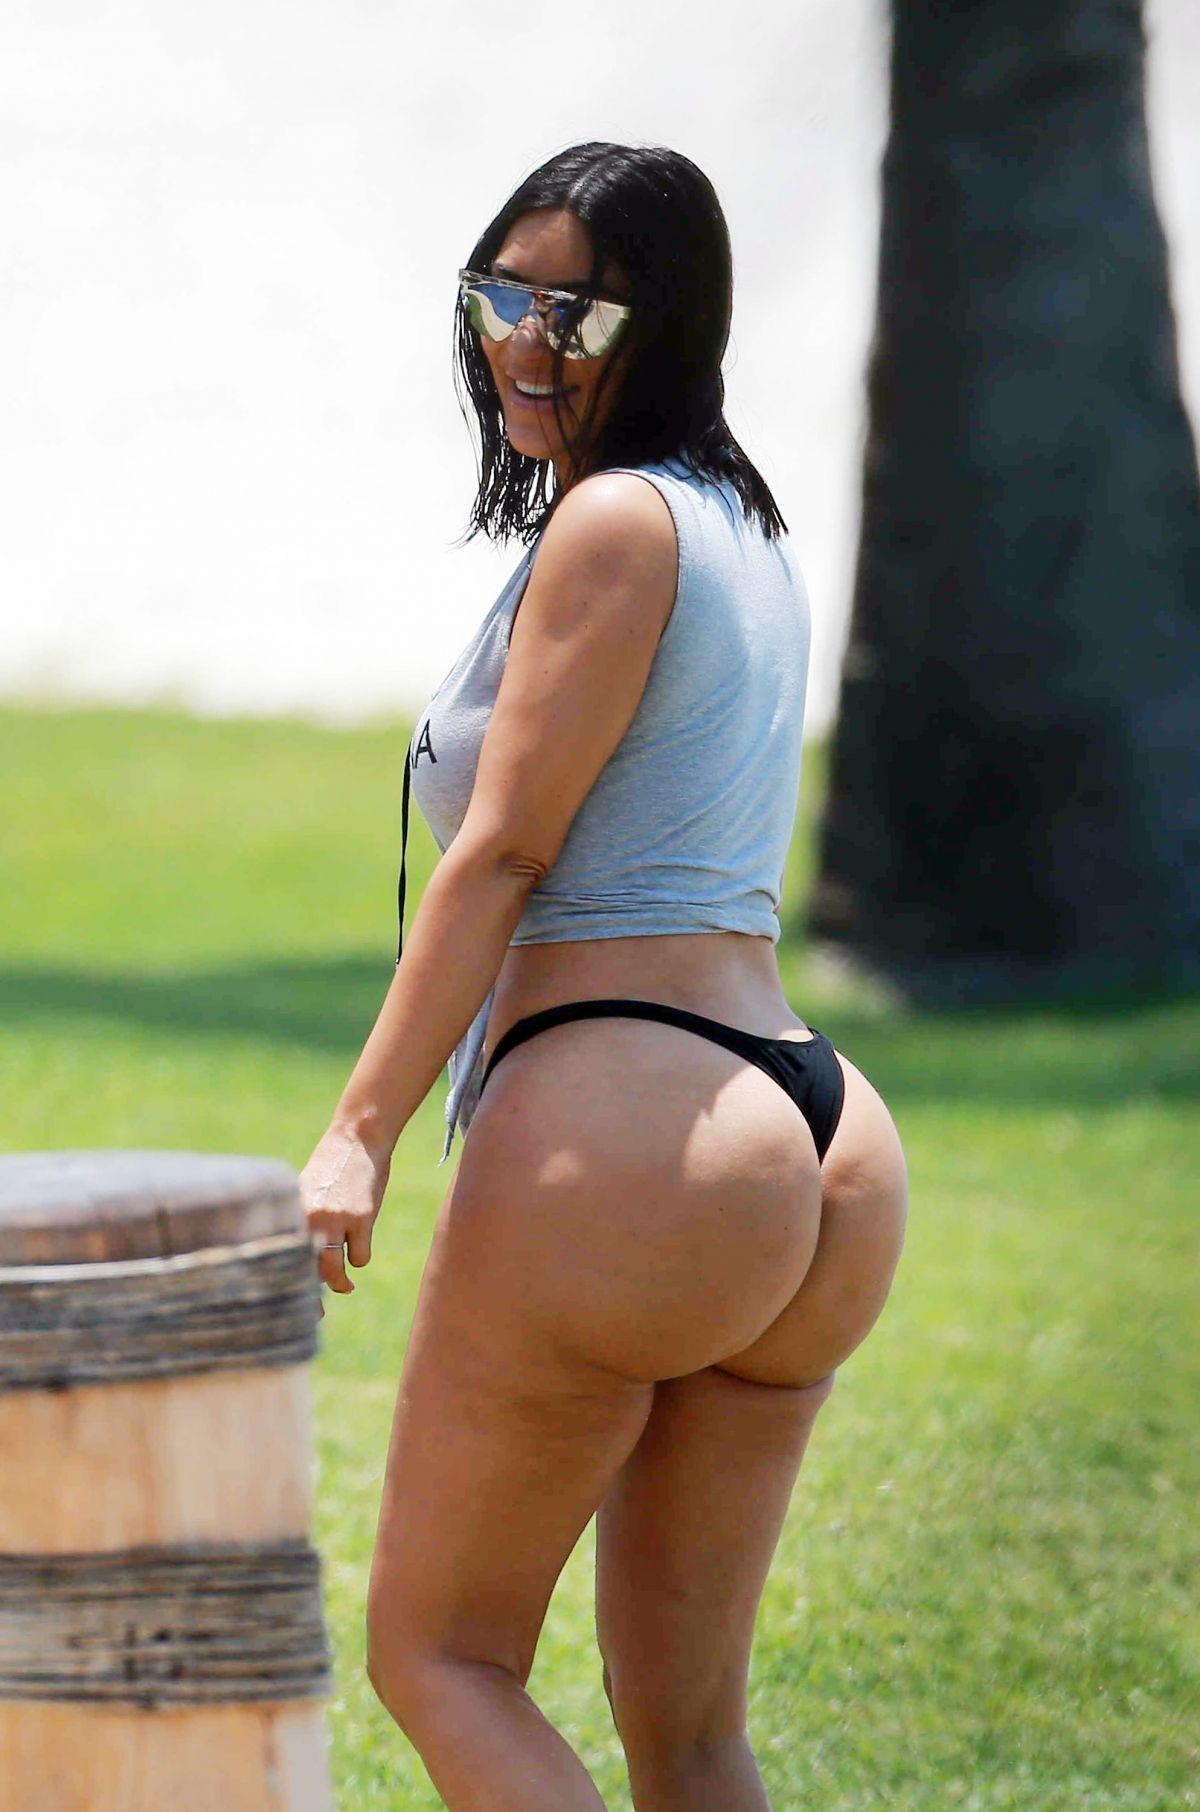 kim-kardashian-in-bikini-bottom-on-vacation-in-tulum-04-24-2017_1